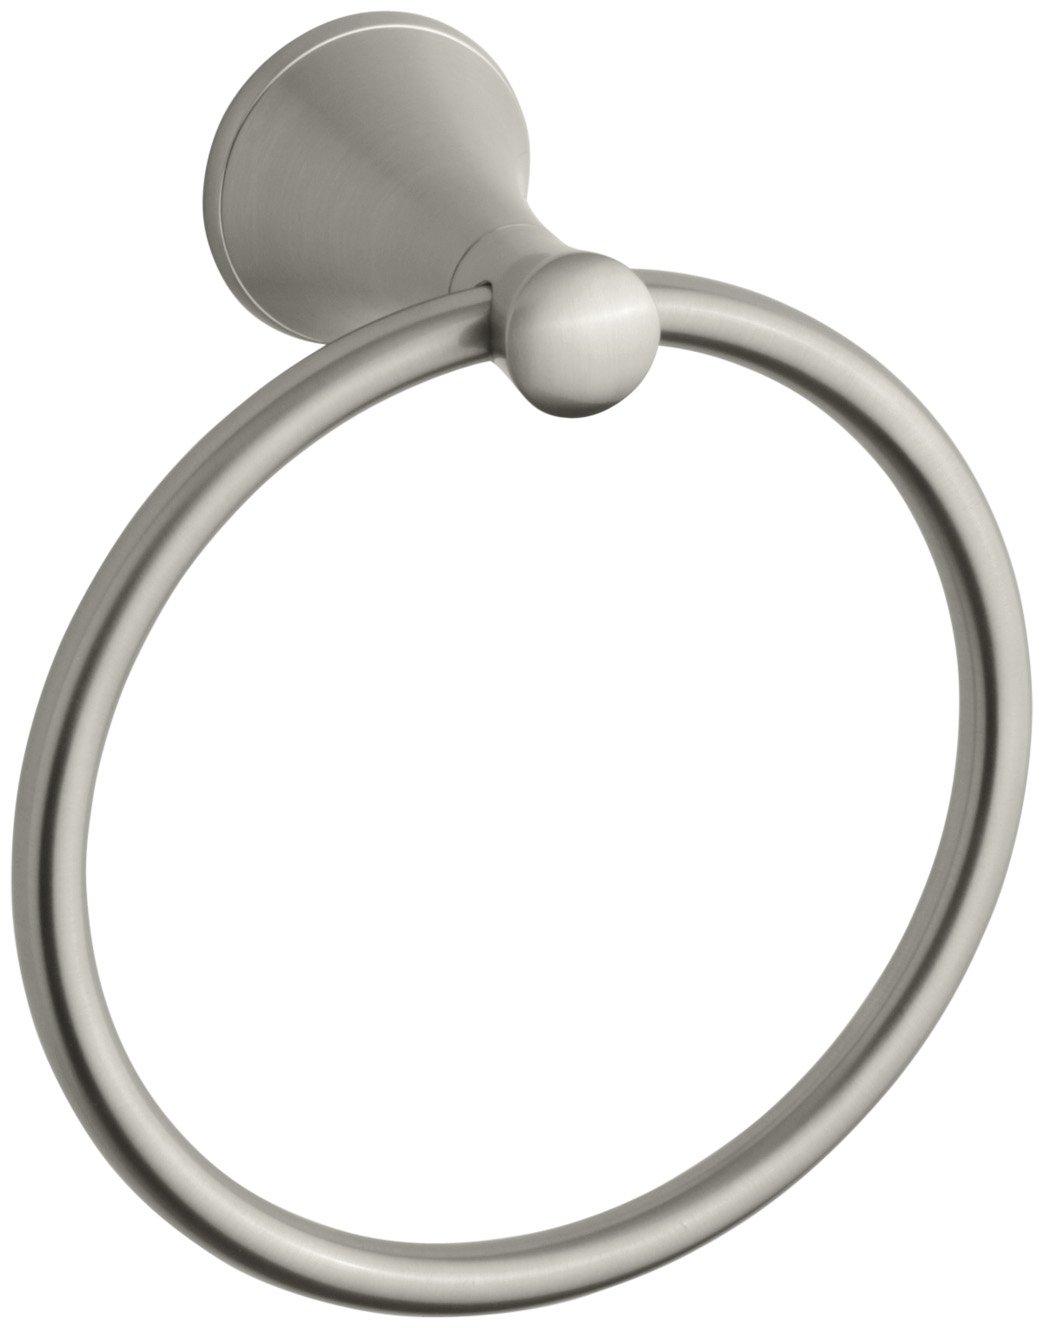 Kohler K-13435-BN Coralais Towel Ring, Vibrant Brushed Nickel